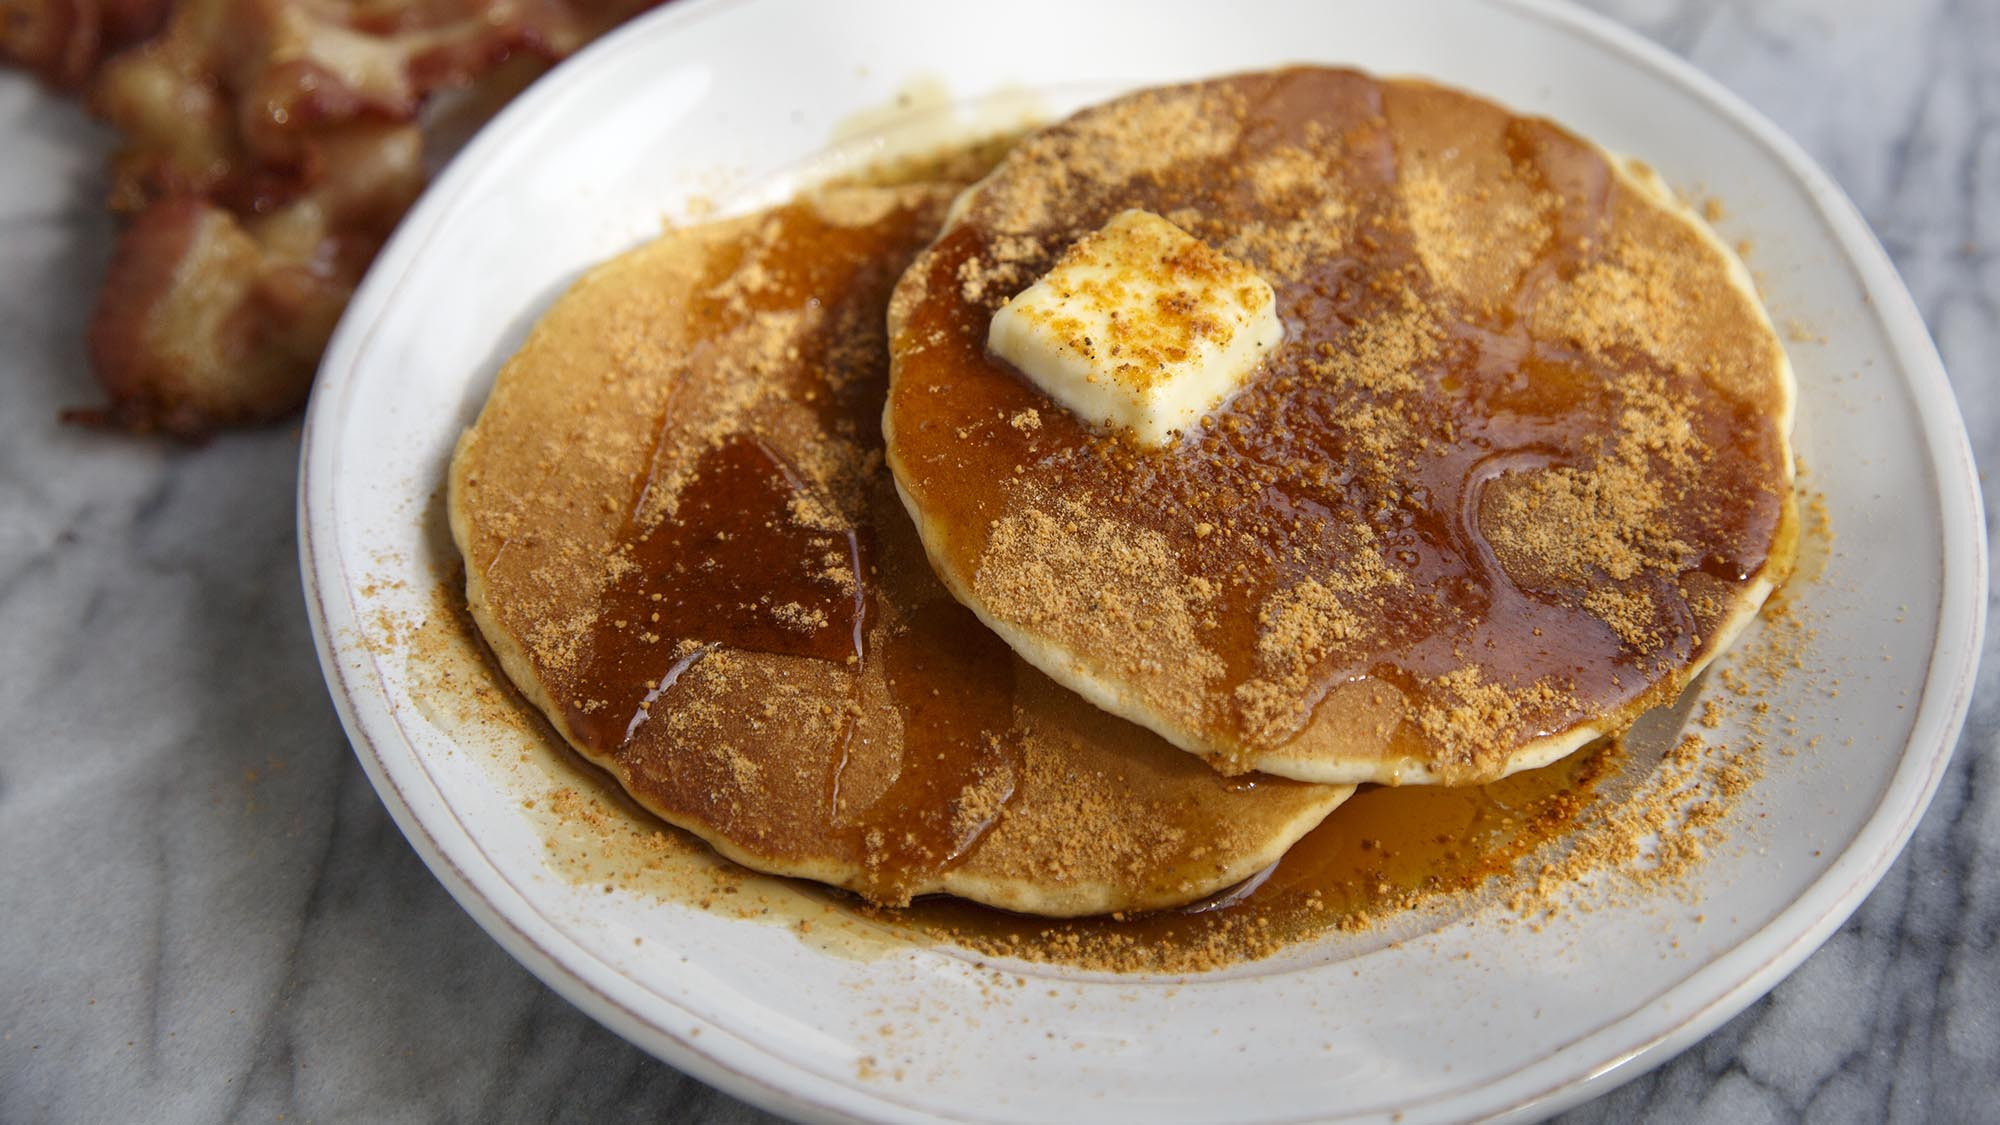 maple_bacon_pancakes_2000x1125.jpg